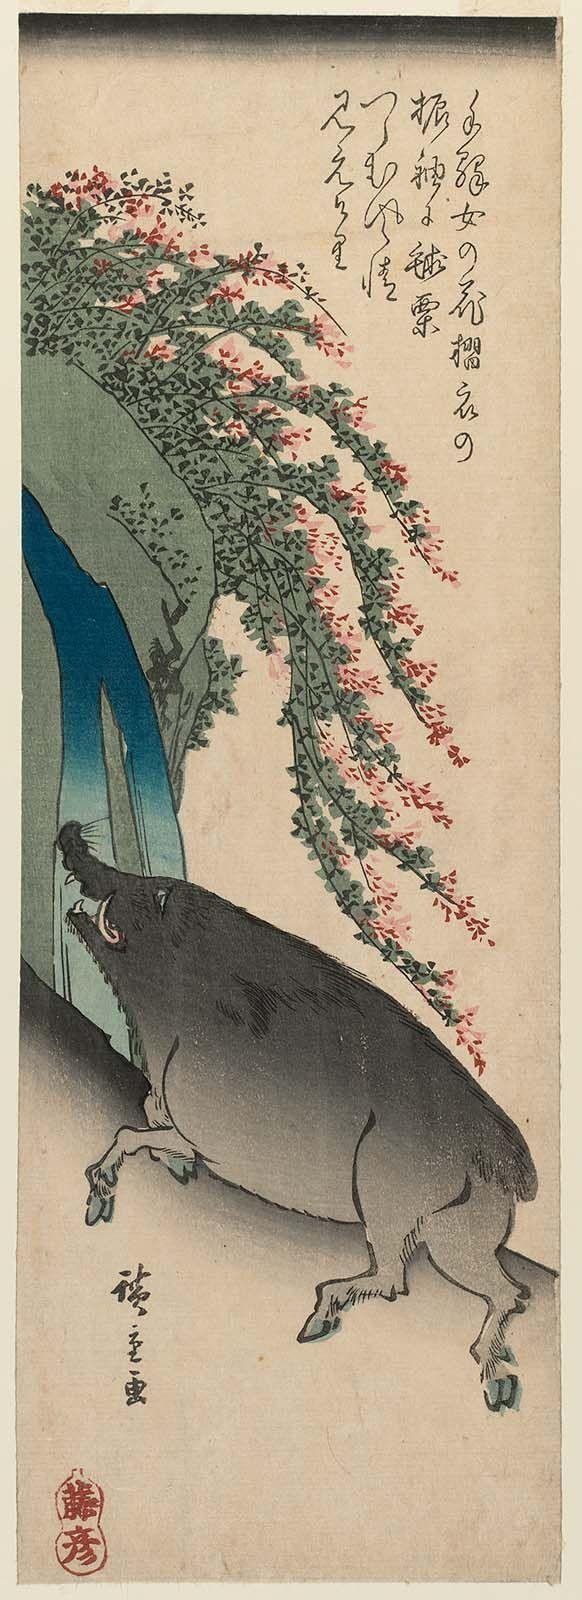 Boar with Waterfall and Bush Clover, from an untitled series of the twelve zodiac animals  Japanese Artist Utagawa Hiroshige I (Japanese, 1797–1858), Publisher Fujiokaya Hikotarô (Shôgendô) (Japanese)  CATALOGUE RAISONNÉ Ukiyo-e shûka 14 (1981), Hiroshige list, p. 240, chûtanzaku #17.12  DIMENSIONS Chûtanzaku; 37 x 12.9 cm (14 9/16 x 5 1/16 in.)  Currently at the MFA ACCESSION NUMBER 21.7040  MEDIUM OR TECHNIQUE Woodblock print (nishiki-e); ink and color on paper